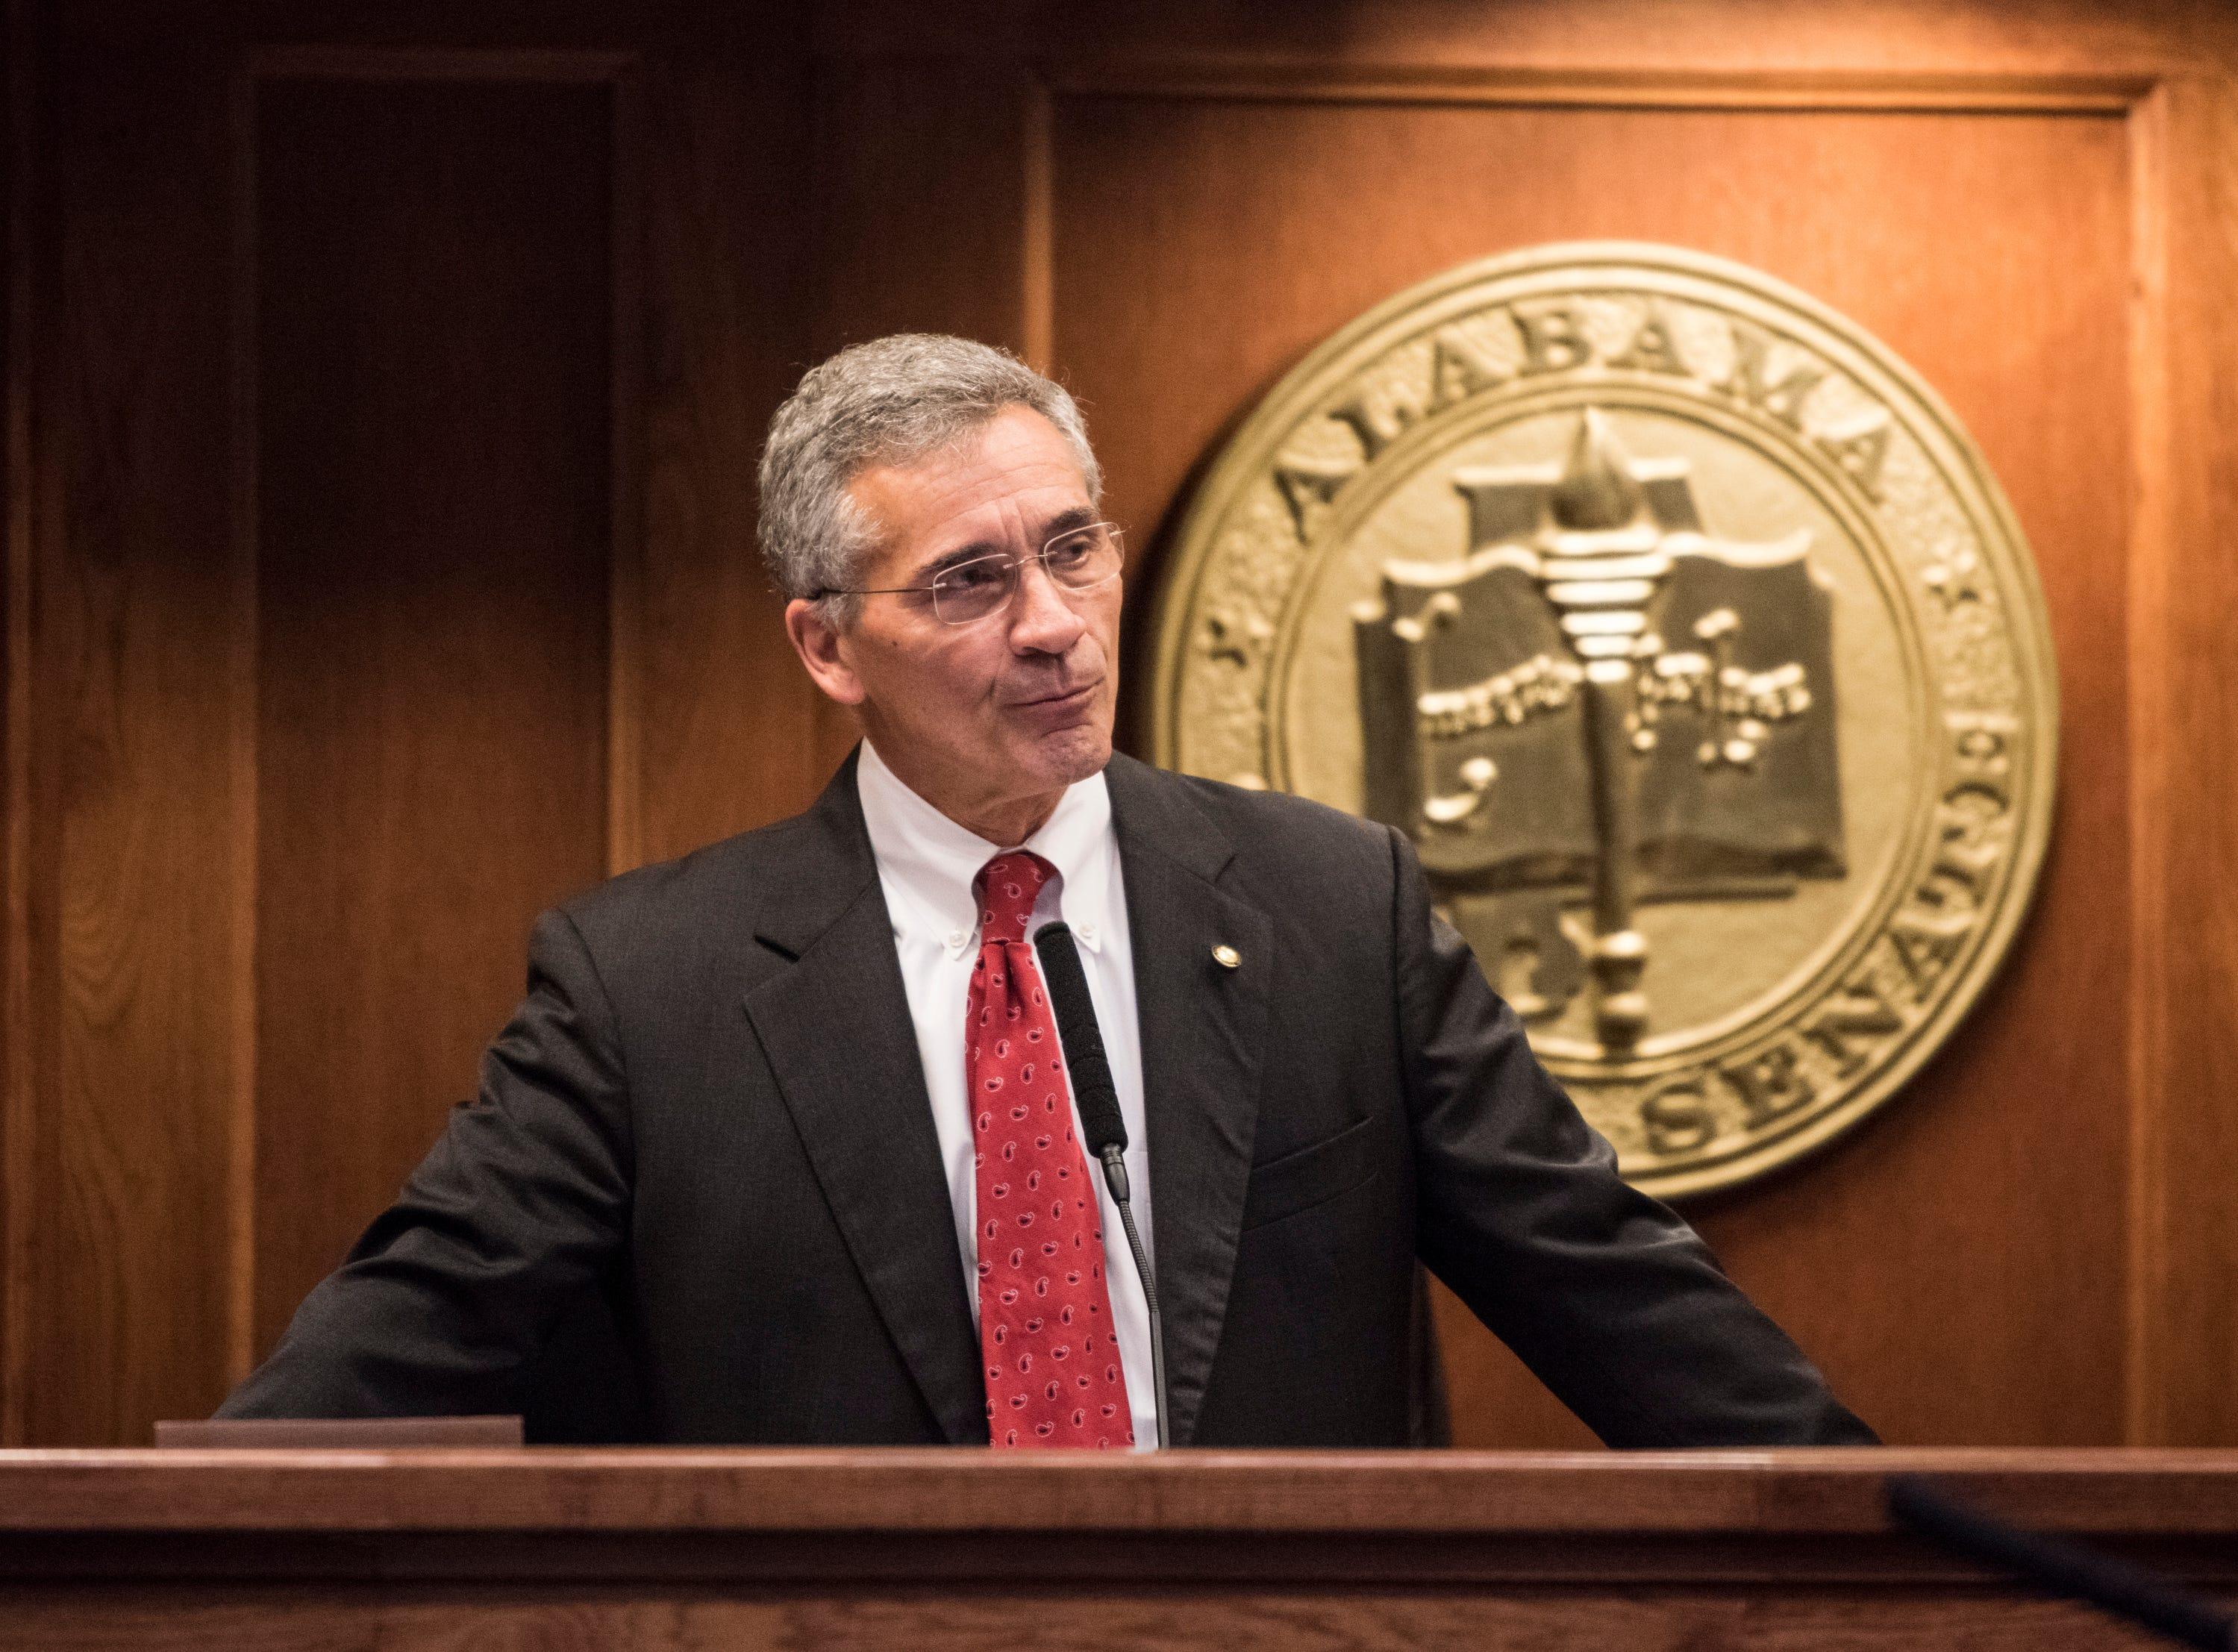 Senate President Pro Tem Del Marsh address the senate during the 2019 Alabama Legislature's organizational session at the Alabama State House in Montgomery, Ala., on Tuesday, Jan. 8, 2019.